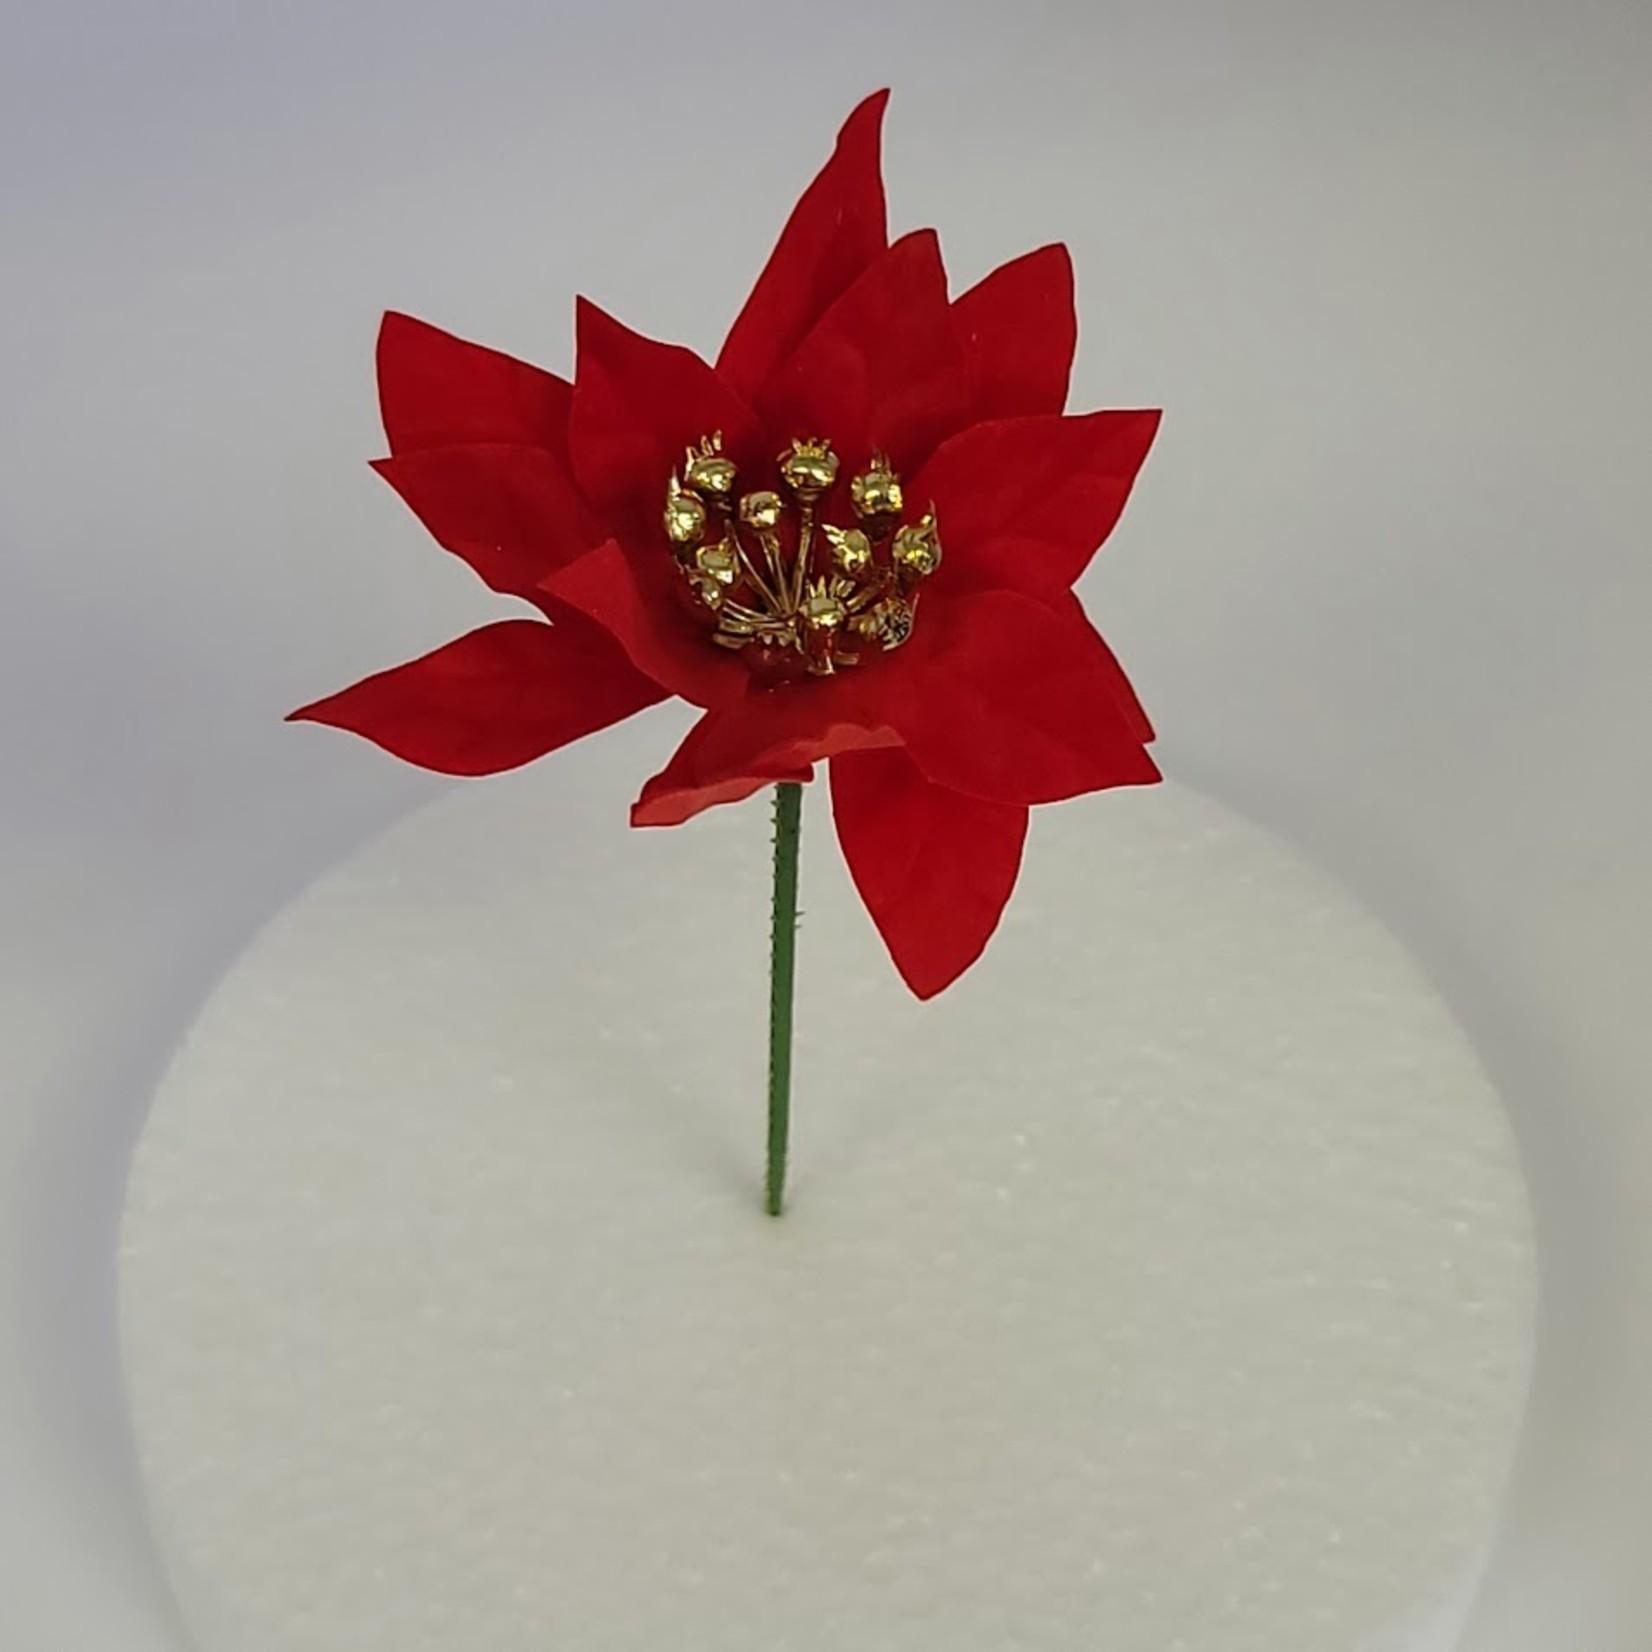 Small Stem Flowers